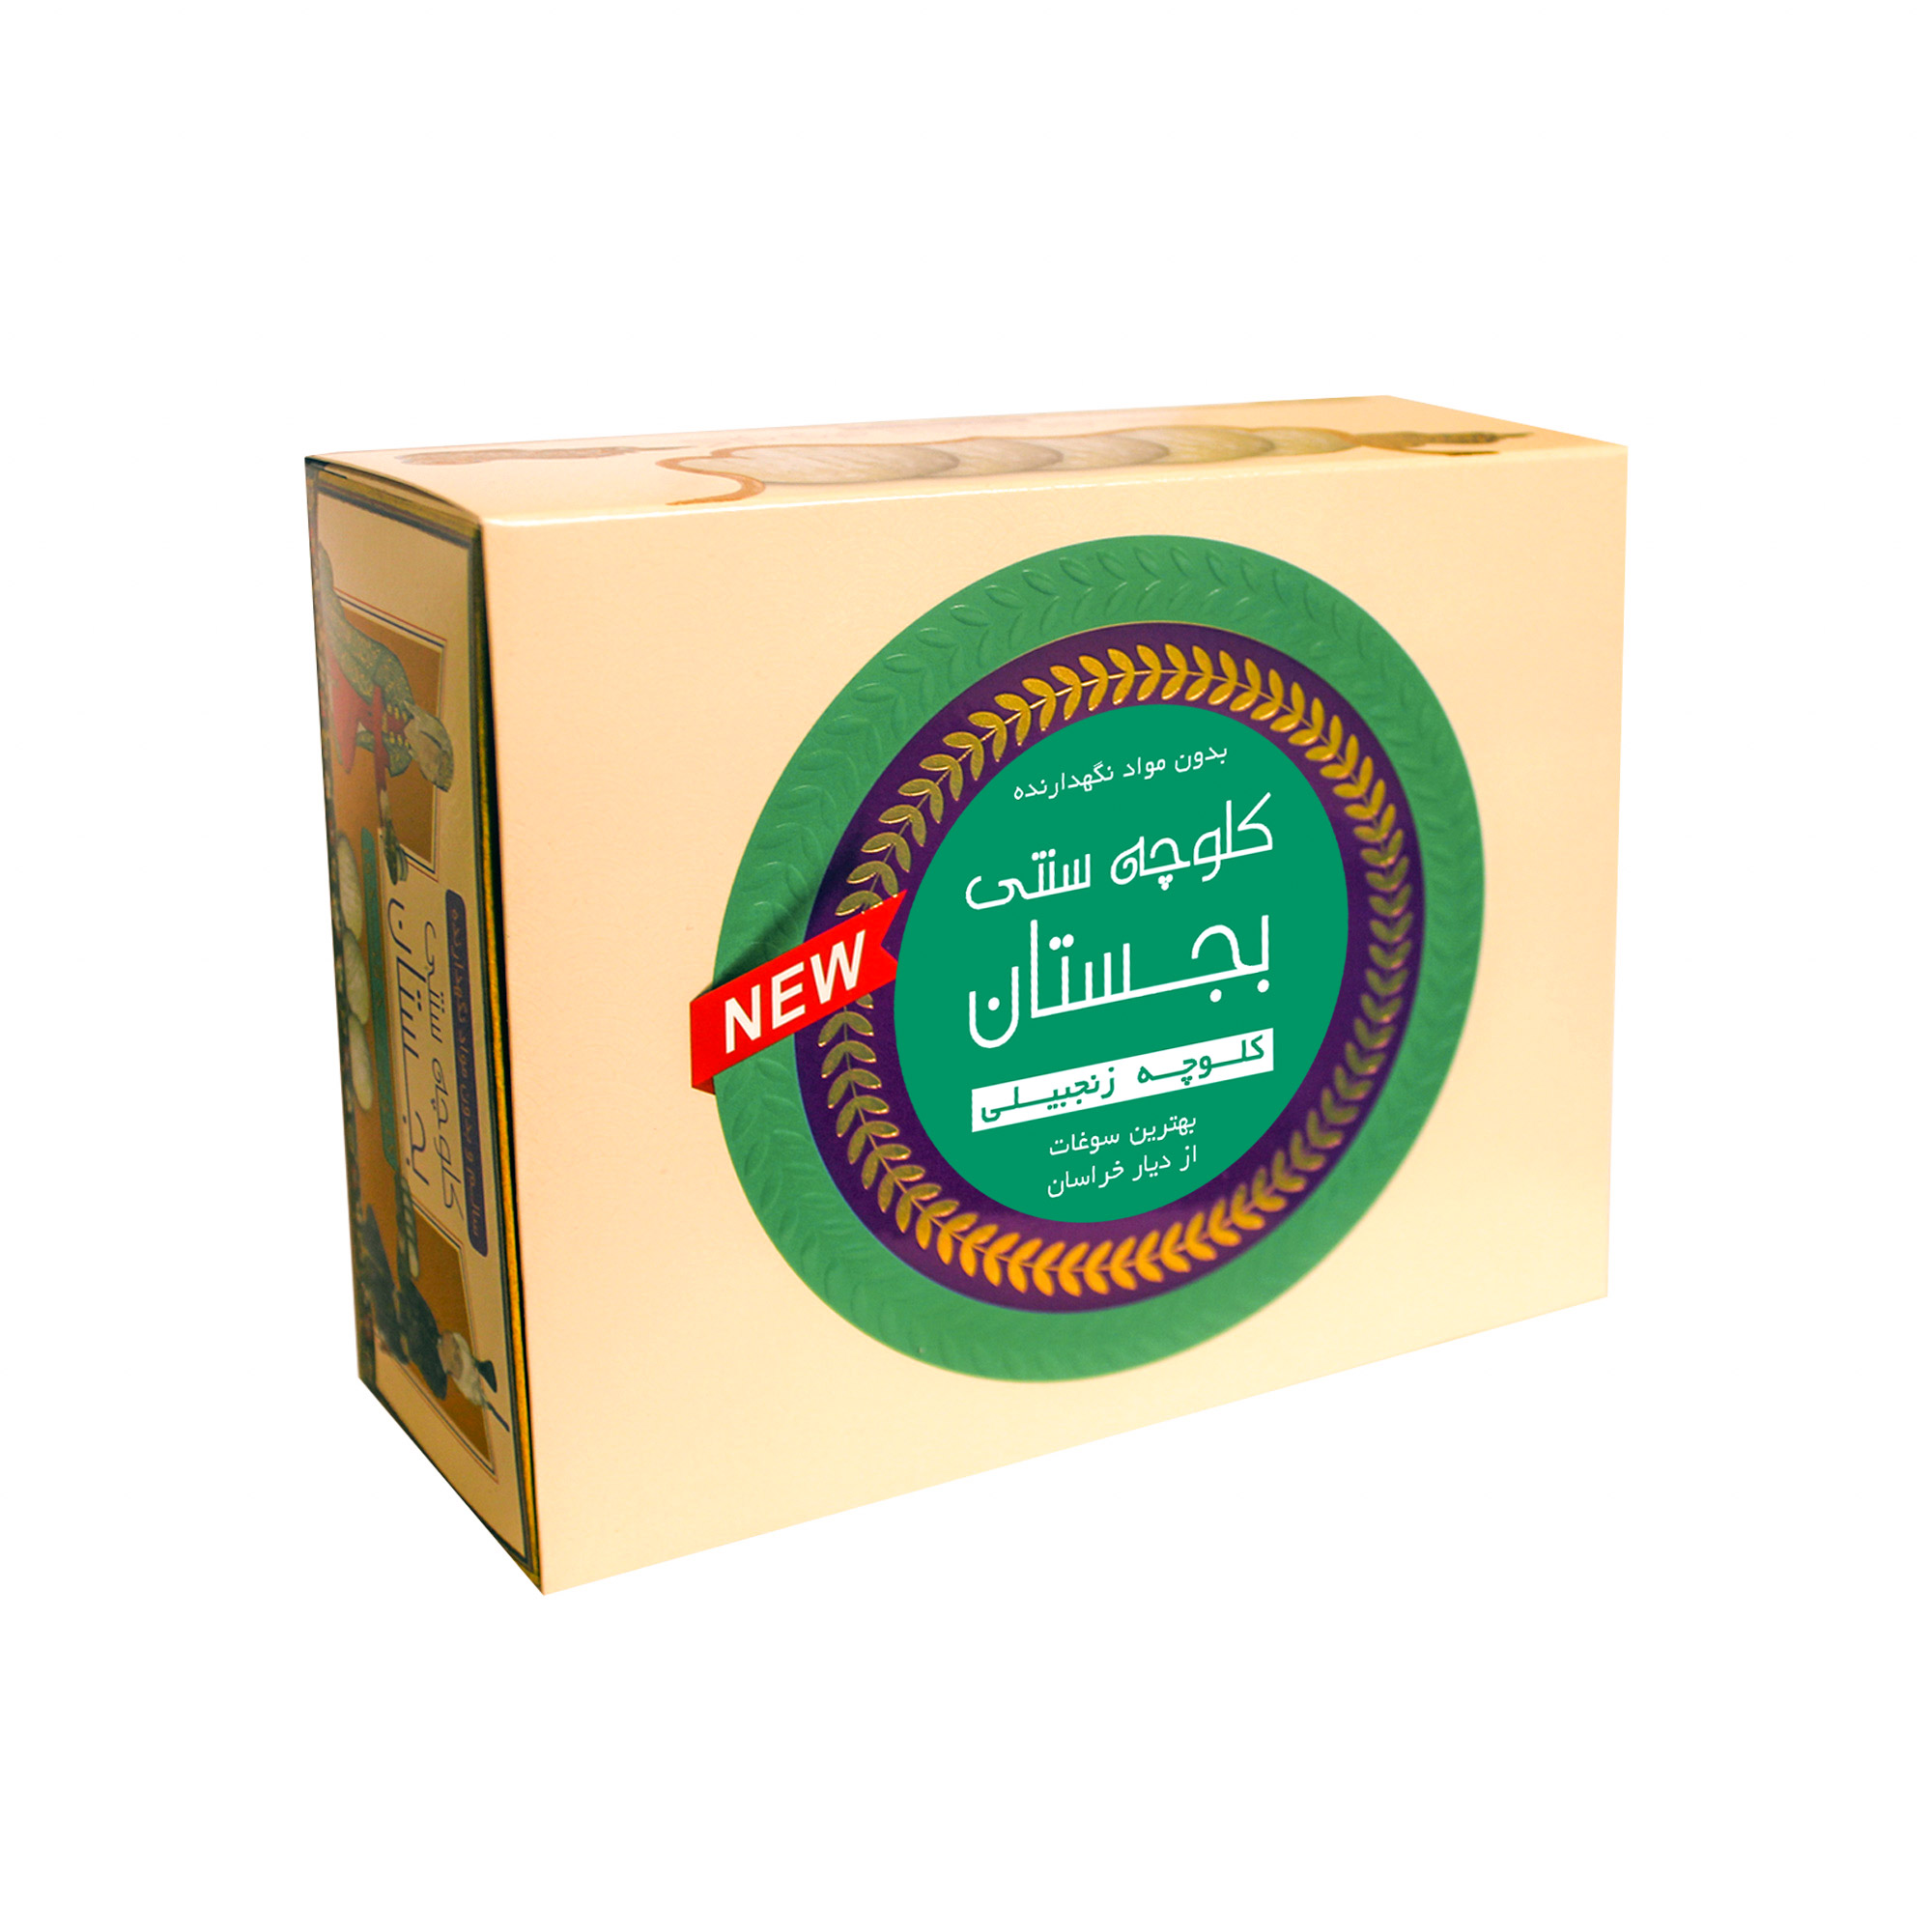 کلوچه زنجبیلی بجستان - 500 گرم بسته 20 عددی